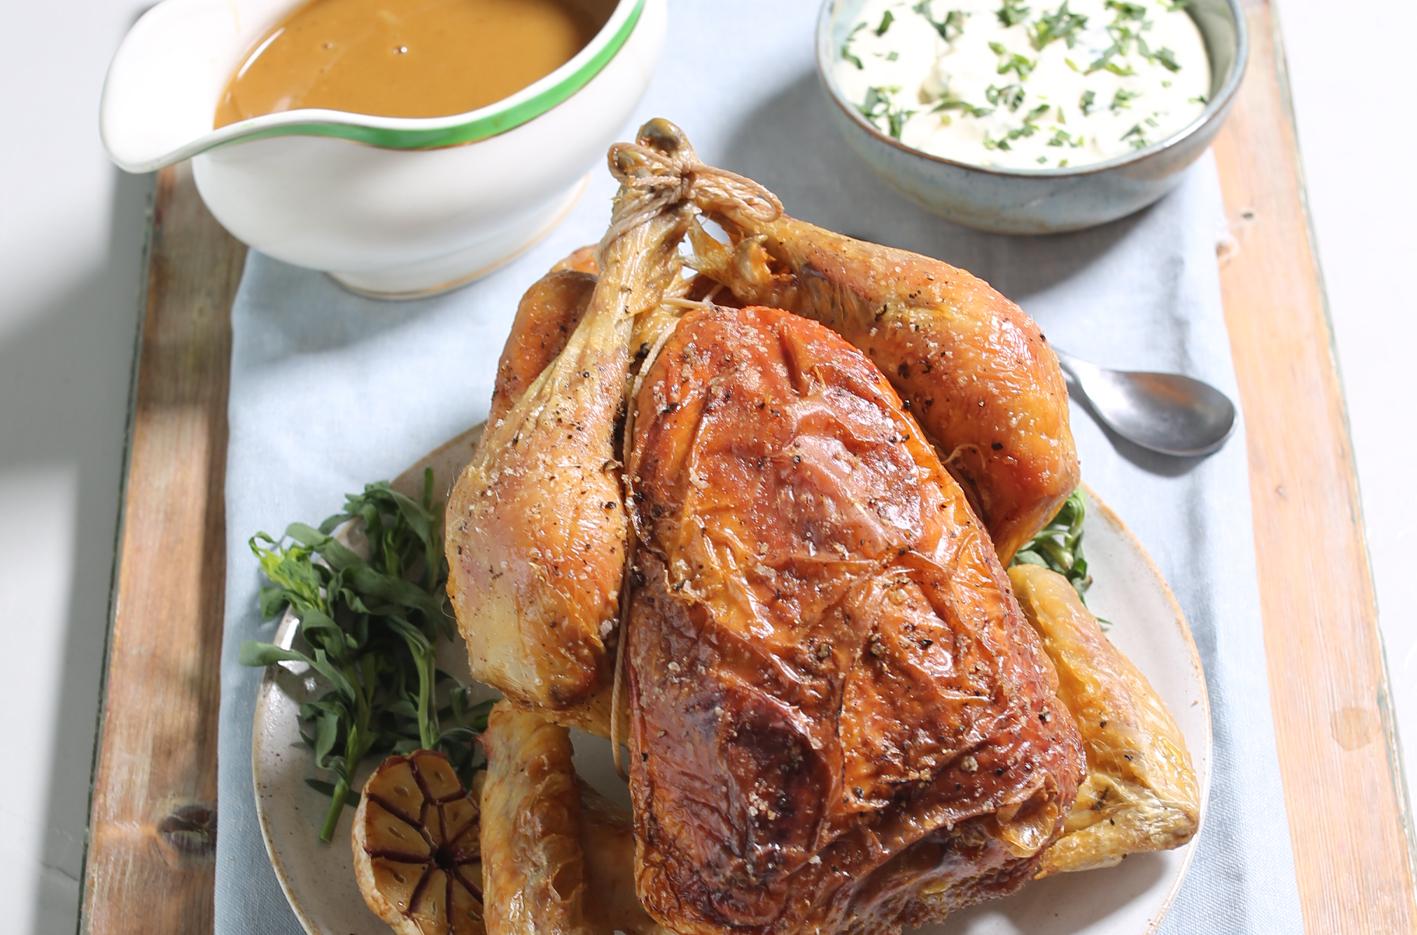 Roast Chicken with Tarragon Crème Fraîche Sauce